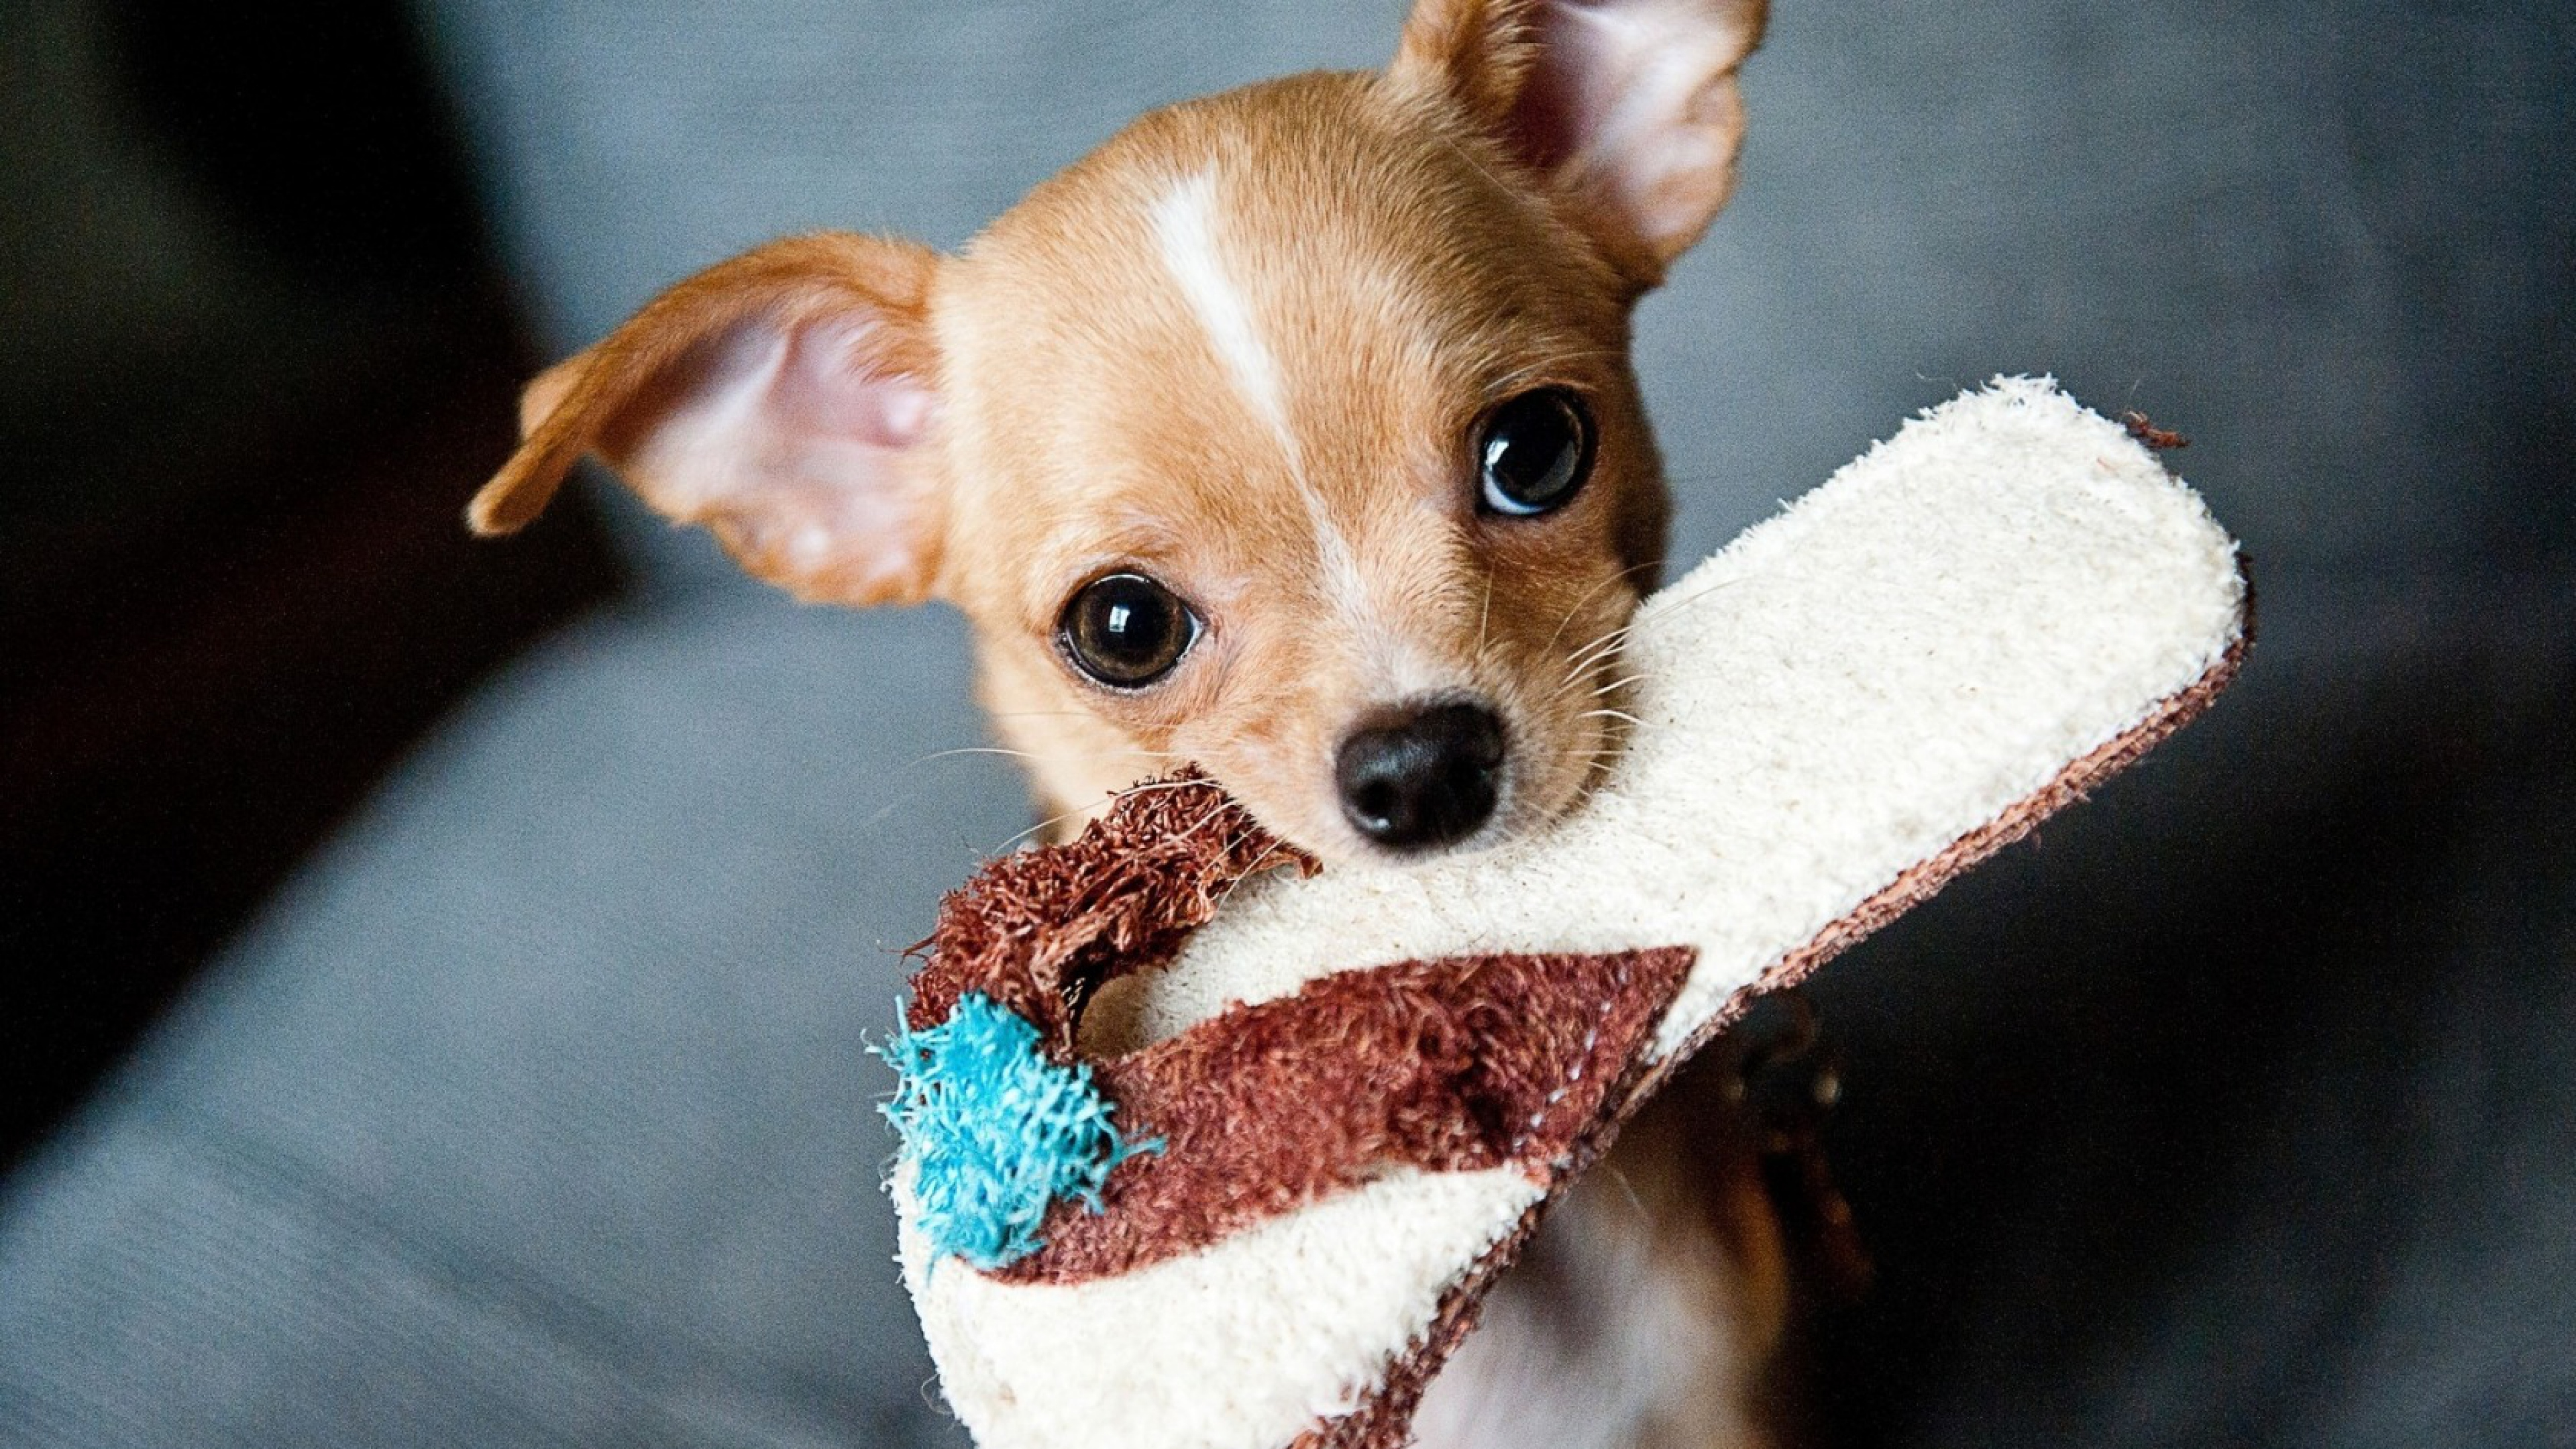 Fondos de pantalla Cachorro Chihuahua